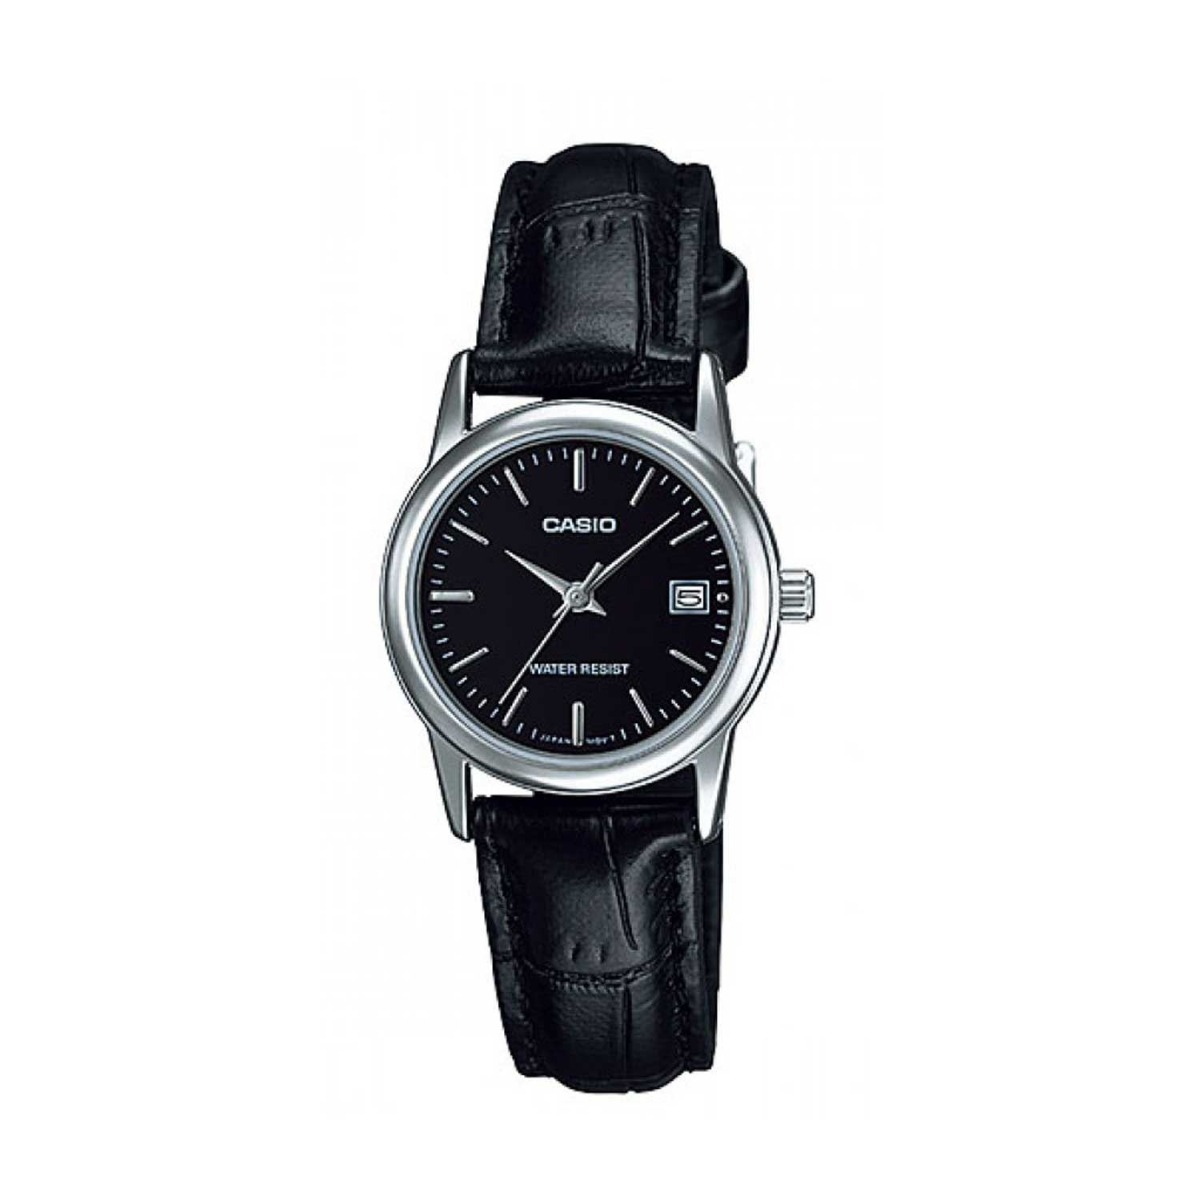 110cdbe3f917 reloj casio dama ltp v002l 1a agente oficial córdoba. Cargando zoom.